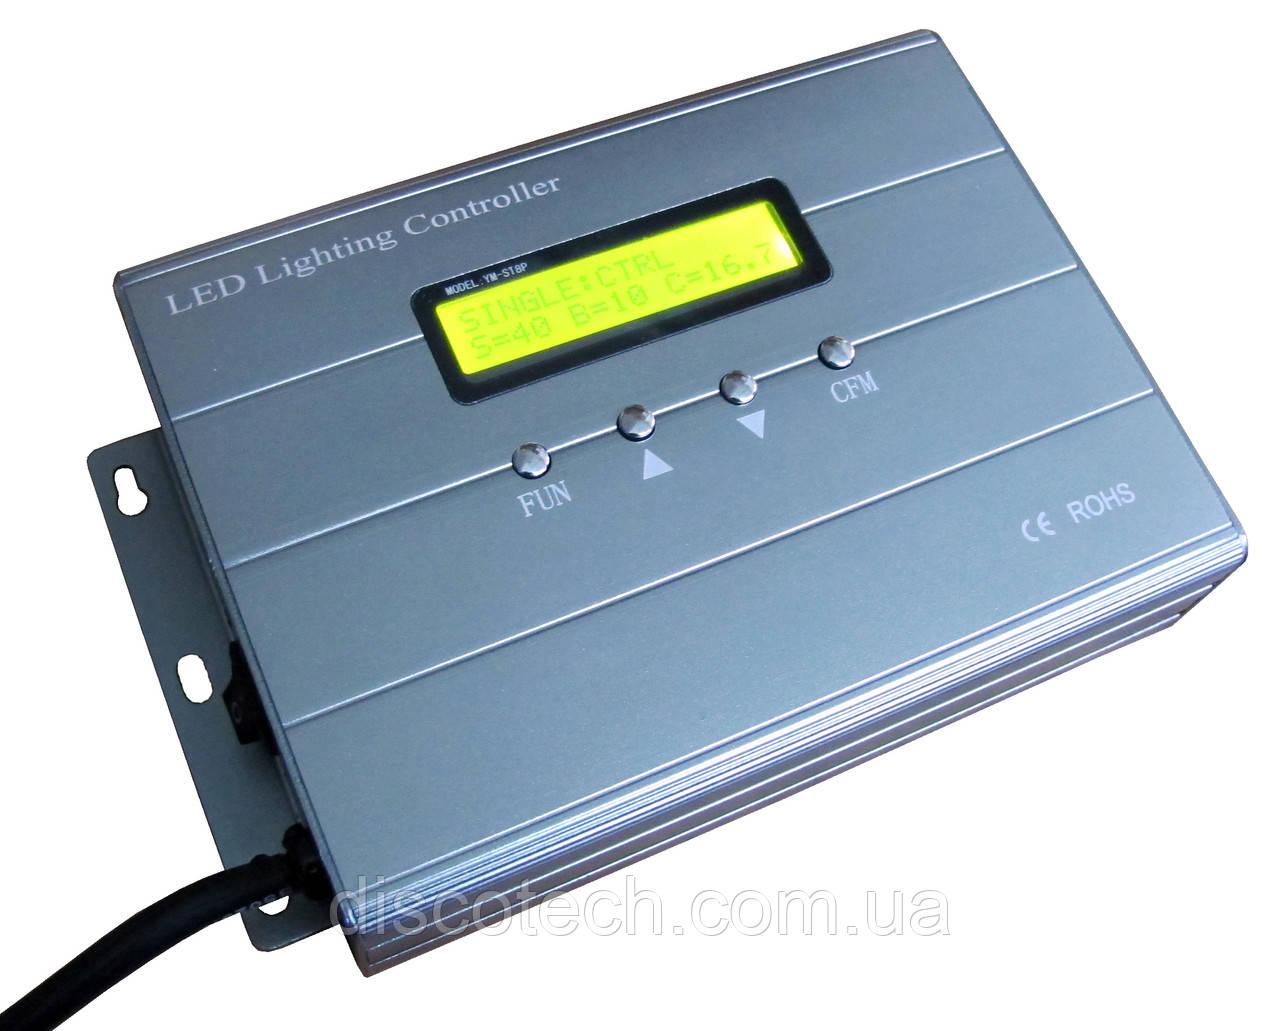 Контроллер для управления RGB пикселями YM-ST4P